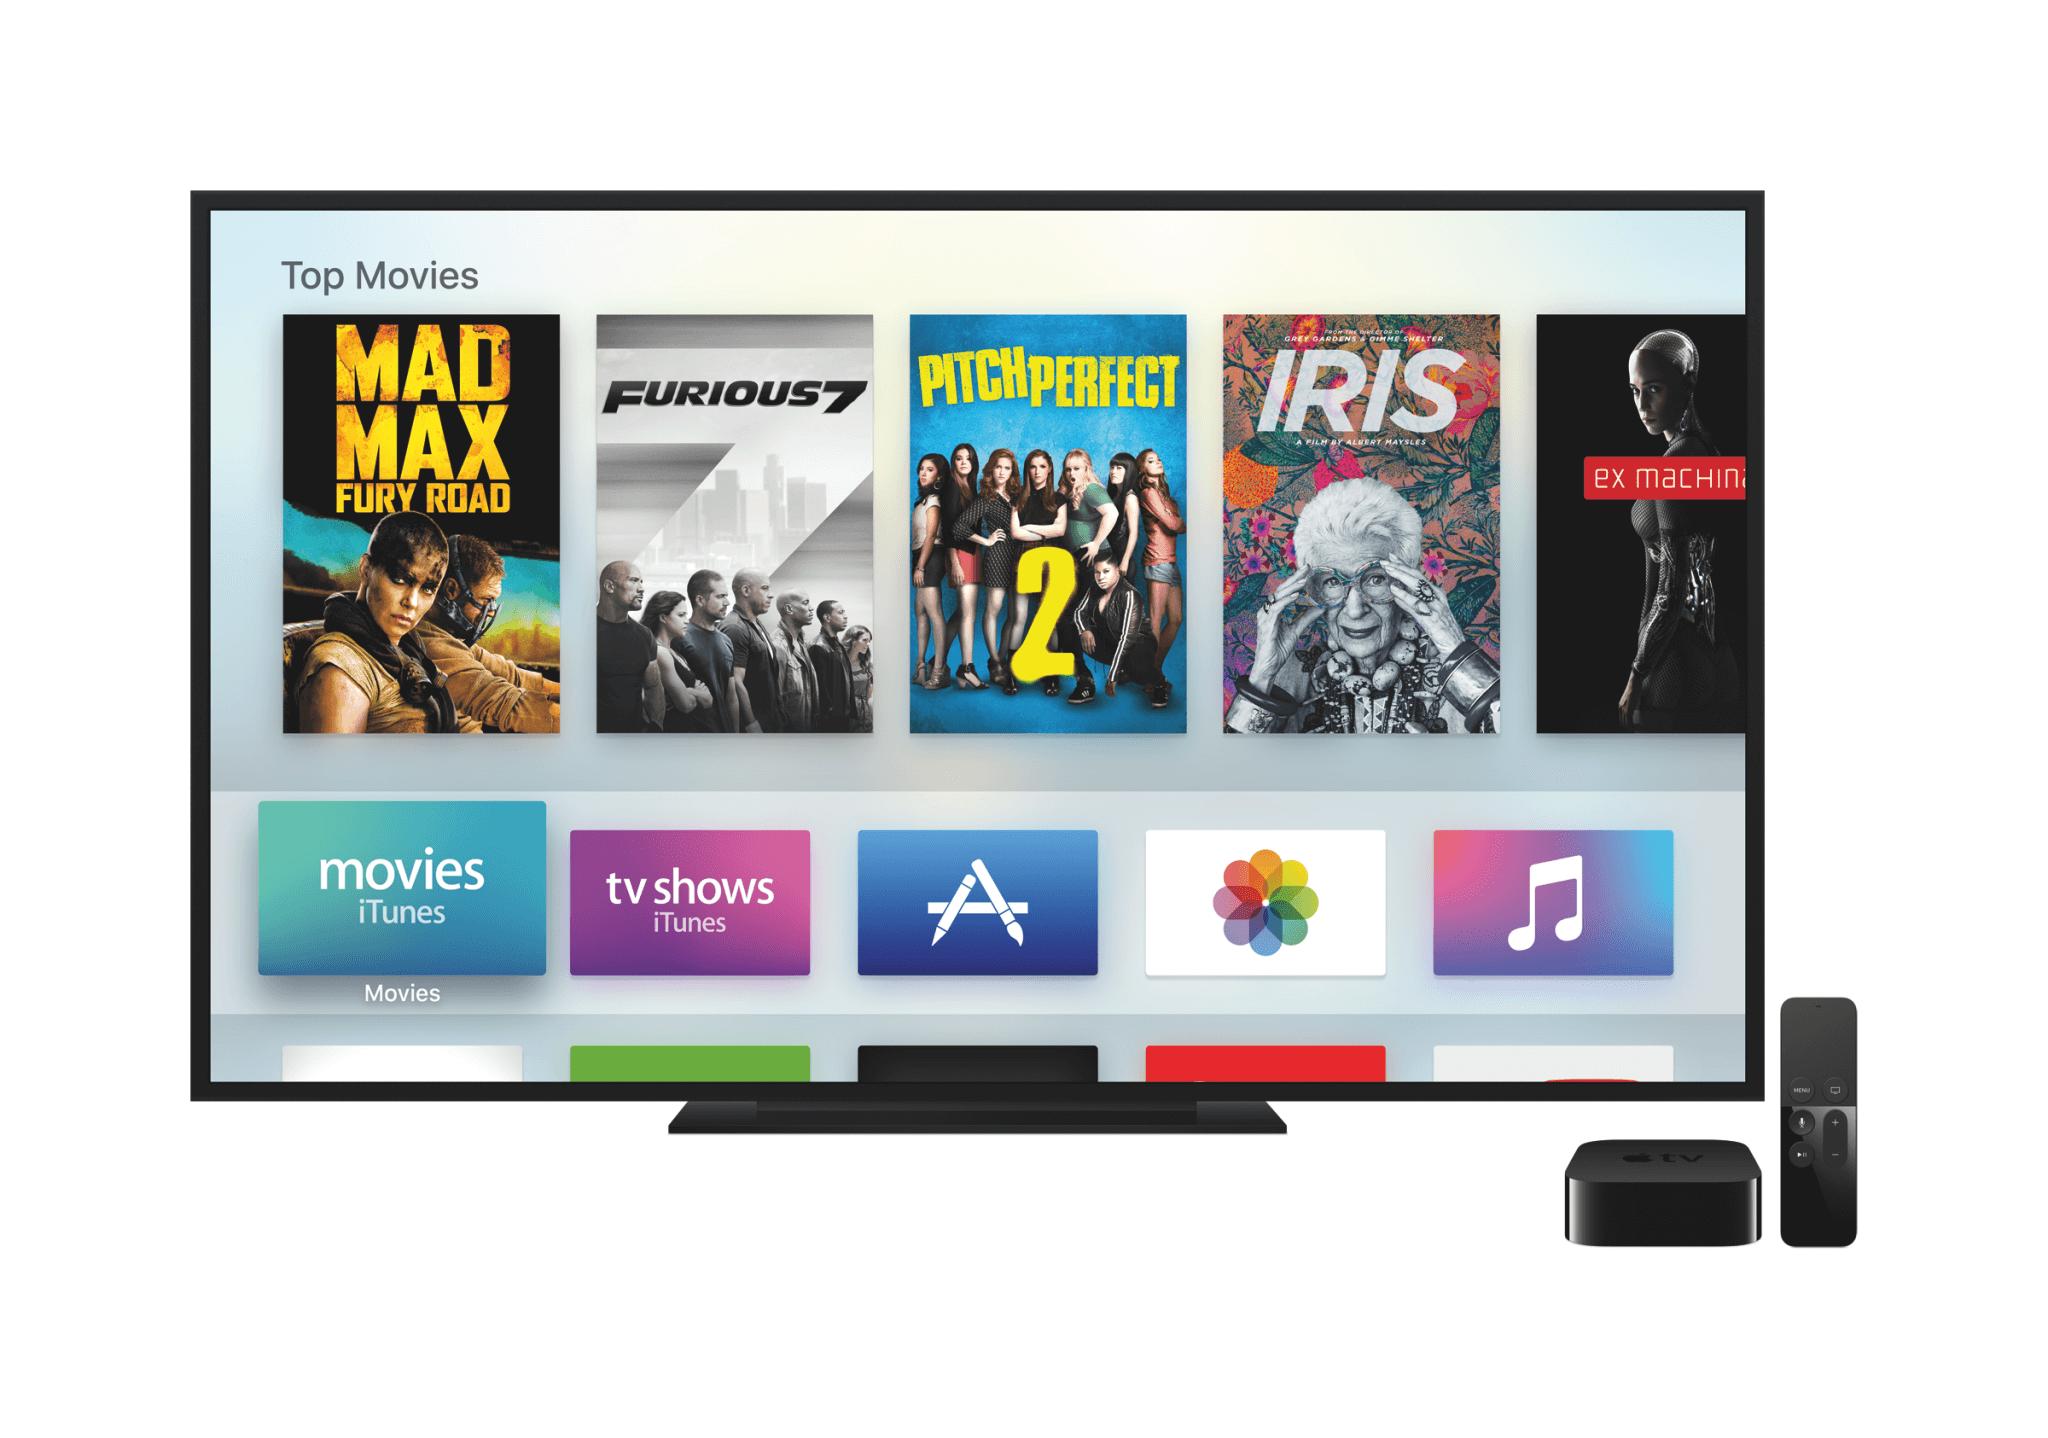 Hauptmenü des Apple TV 4 (Bildrechte: Apple)